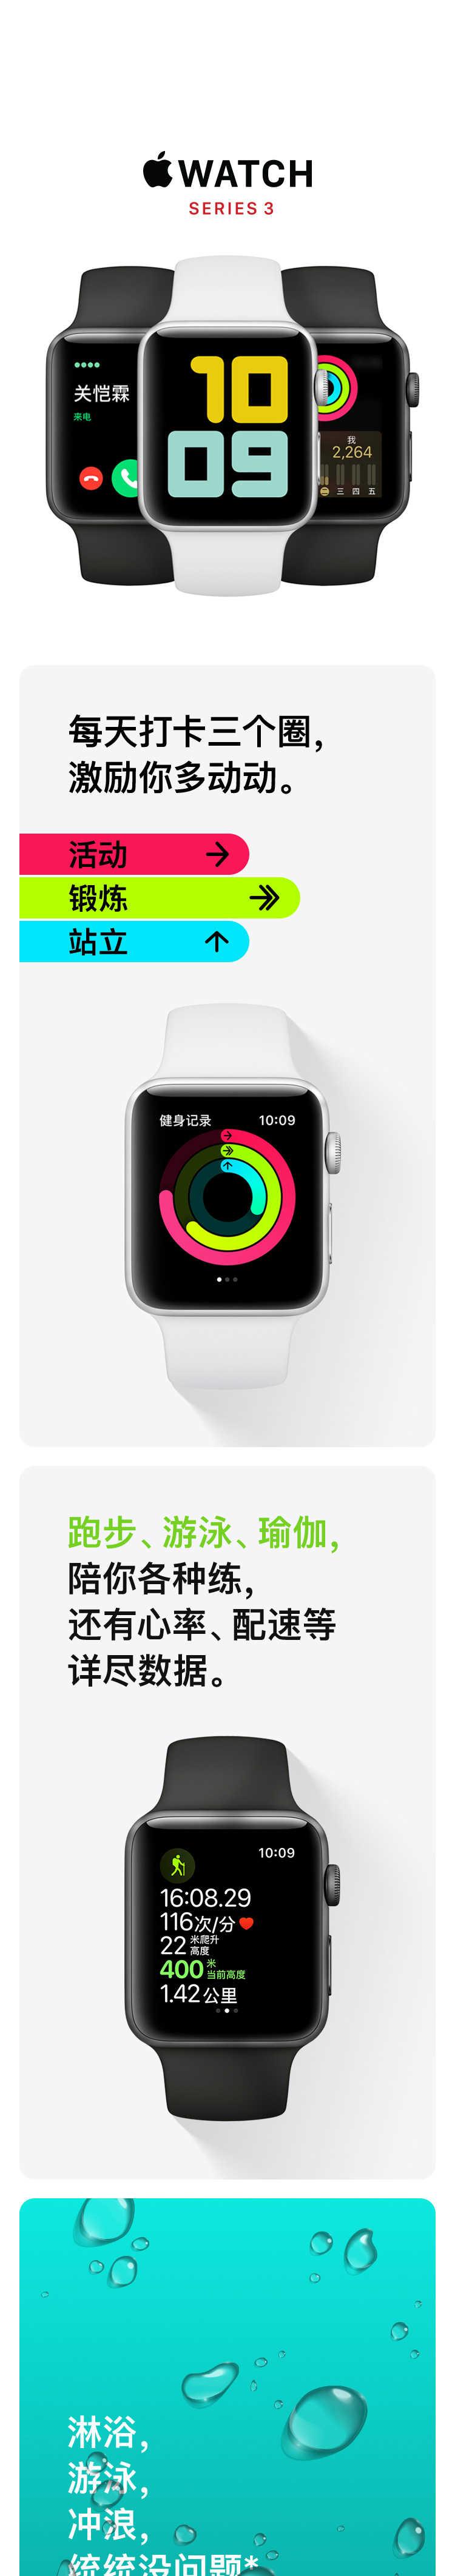 applewatchseries3和se的区别-哪款更值得入手-参数对比